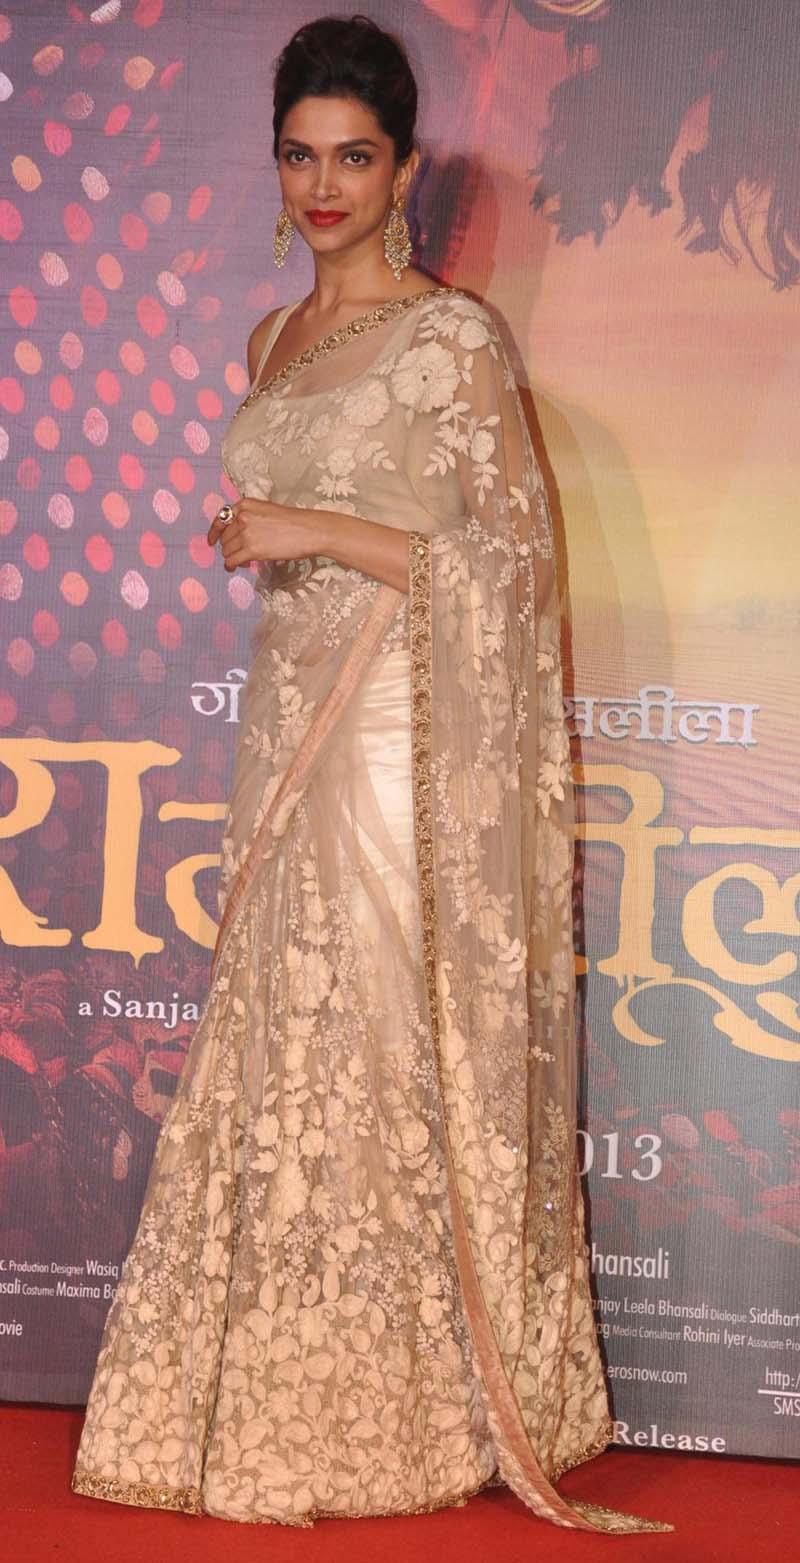 Deepika Padukone Hair 2012 deepika padukone hair ...